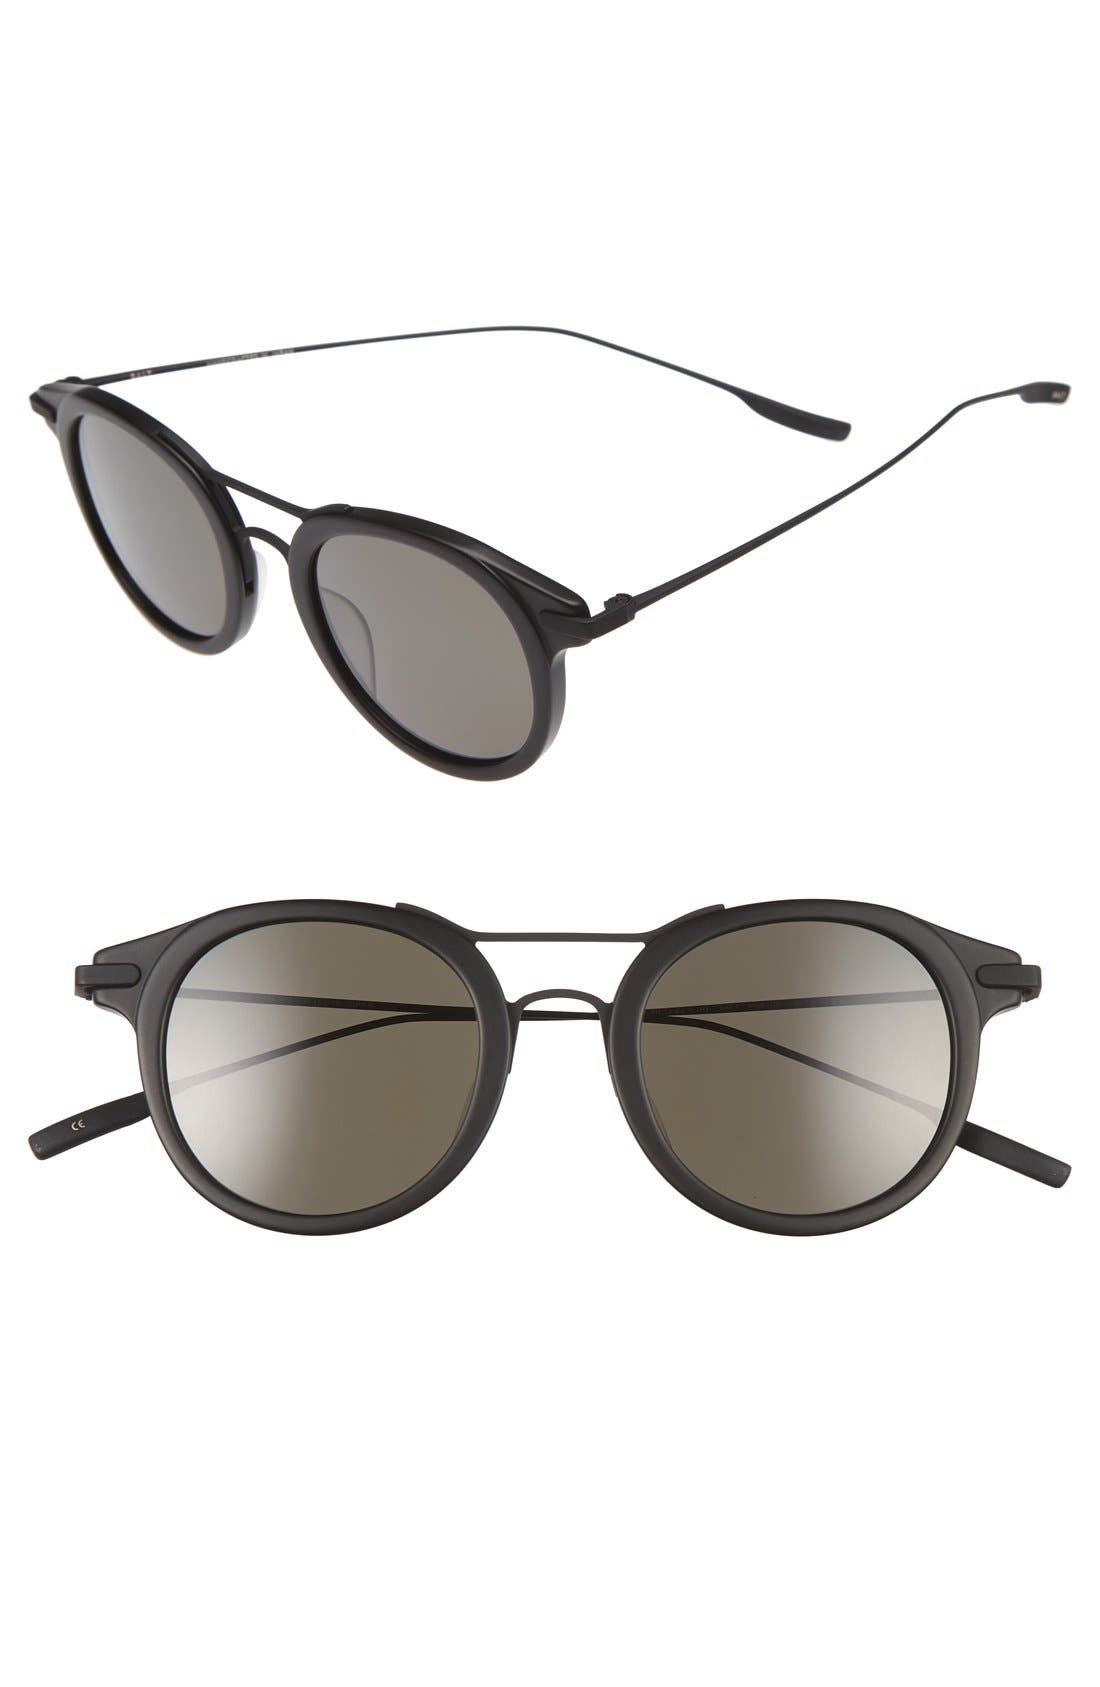 Taft 46mm Polarized Round Sunglasses,                         Main,                         color, Matte Black/ Black Sand